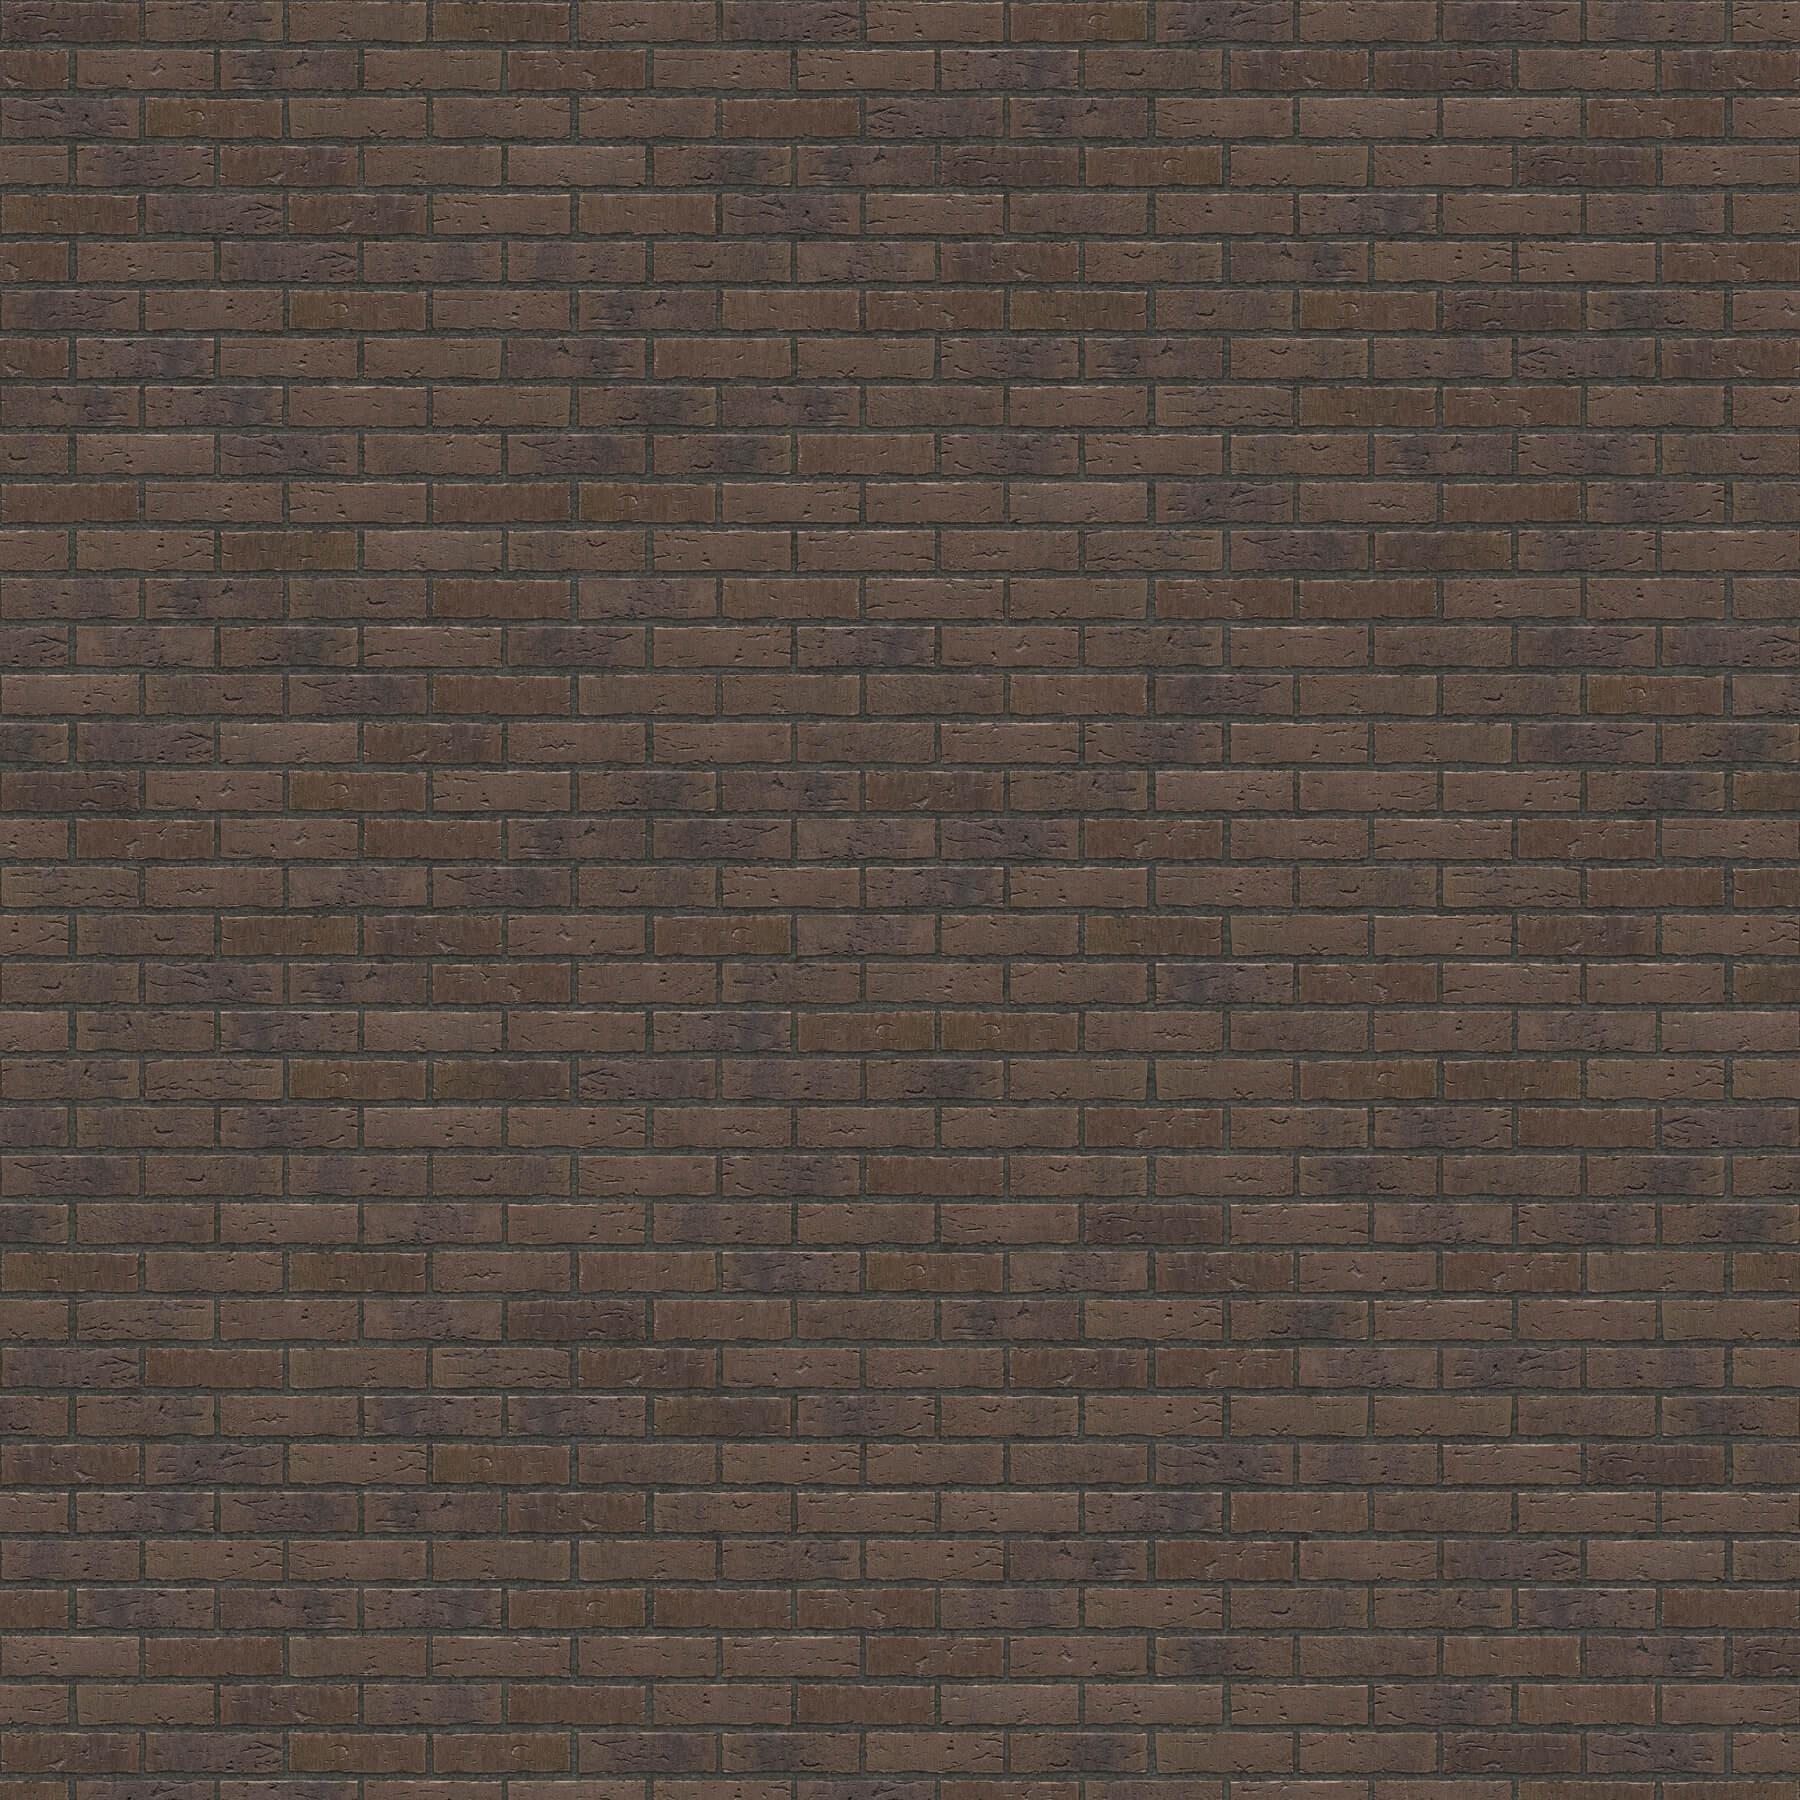 Dekorativna cigla listela FeldHaus Klinker r-697 nf Antracit fuga